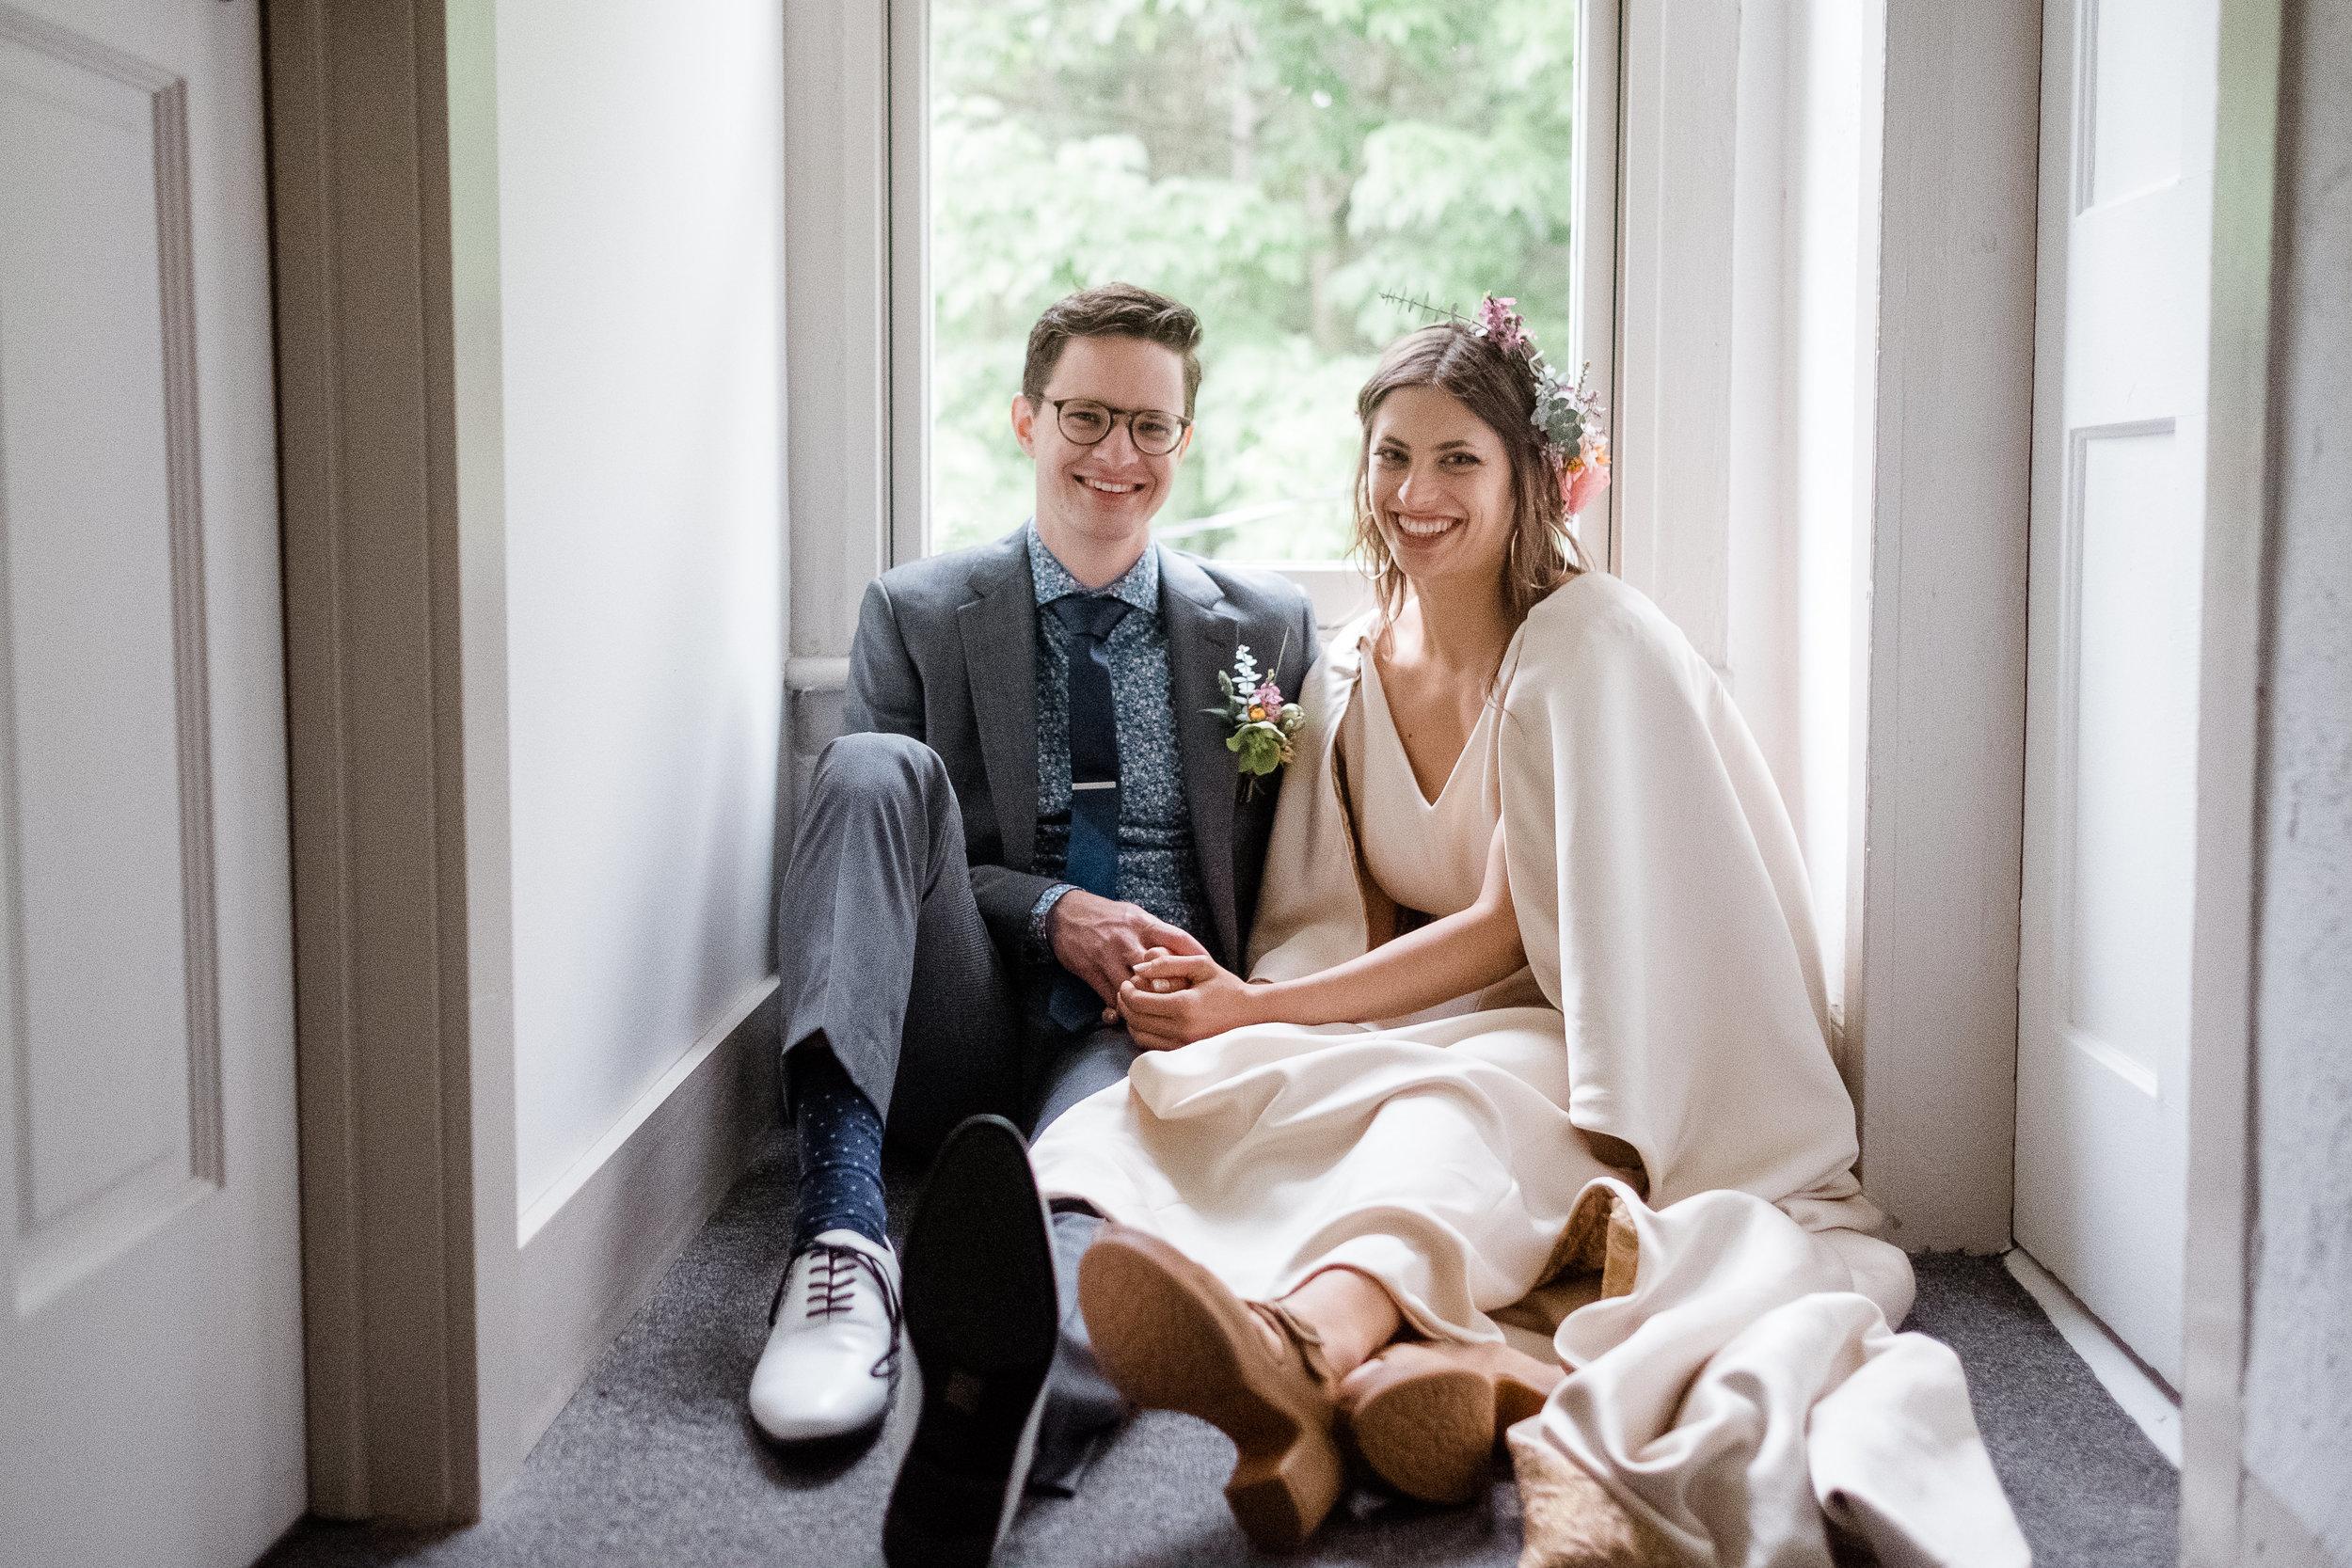 WSPCo-05272018-Aliya-Eric-Wedding-Sneak-Peek-10.jpg